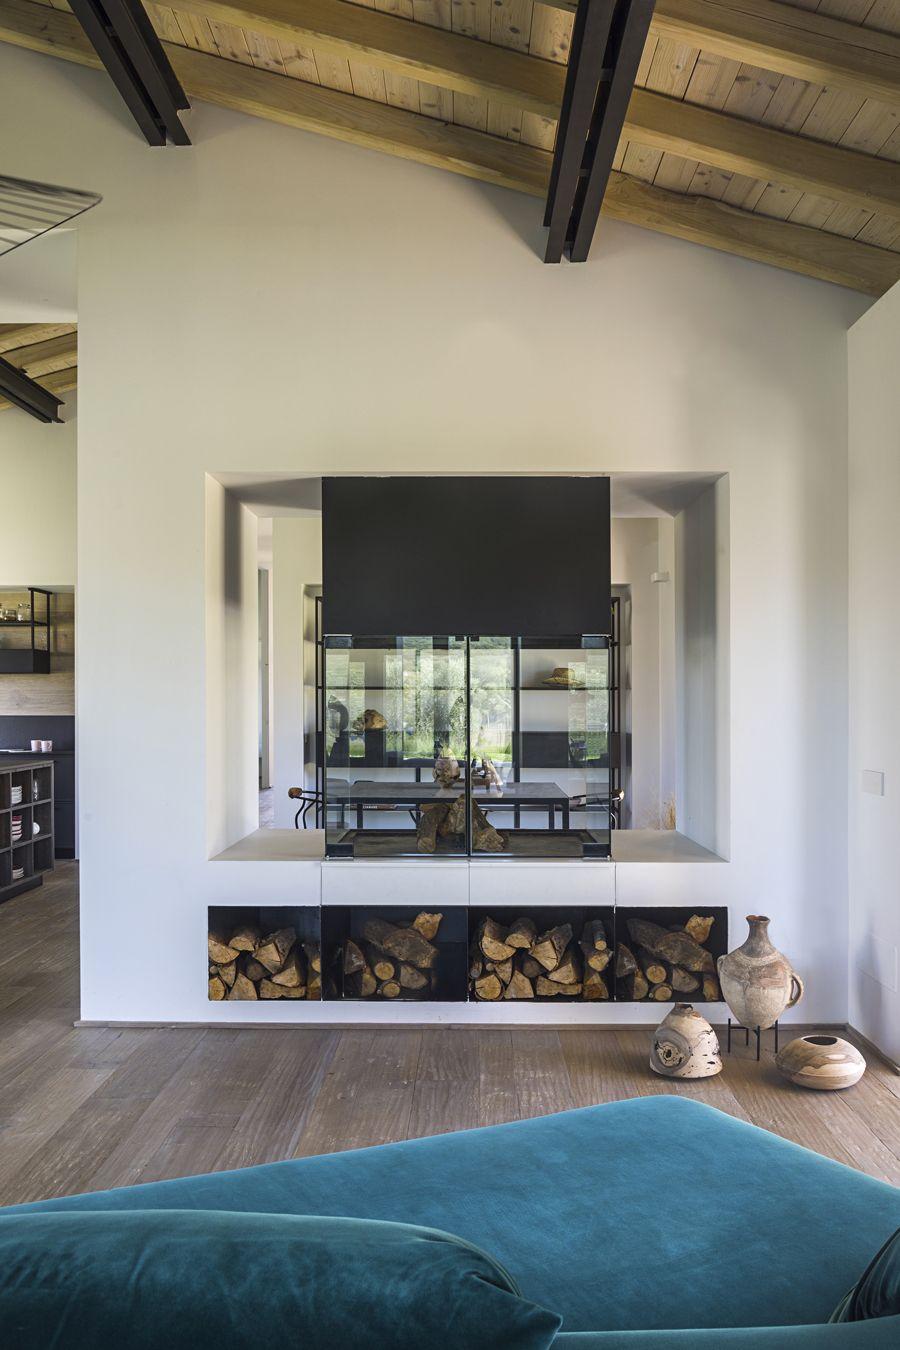 Capalbio Barn House - image 6